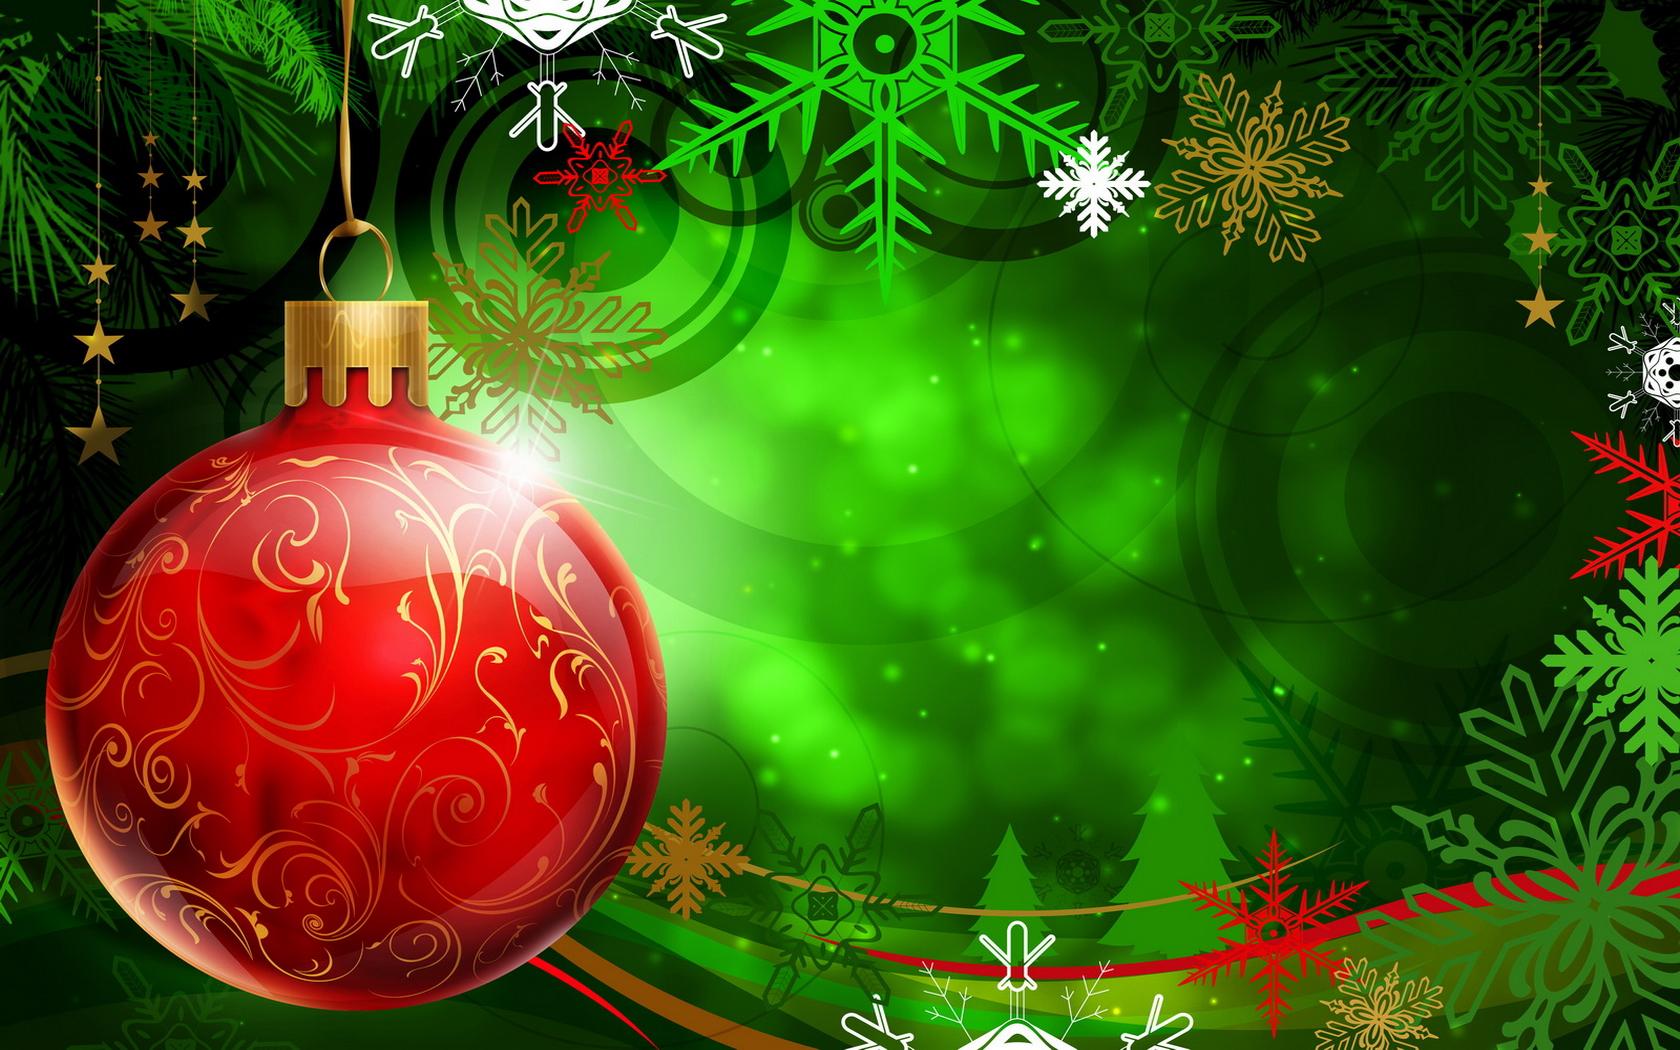 live christmas wallpaper android | free live christmas wallpaper ...